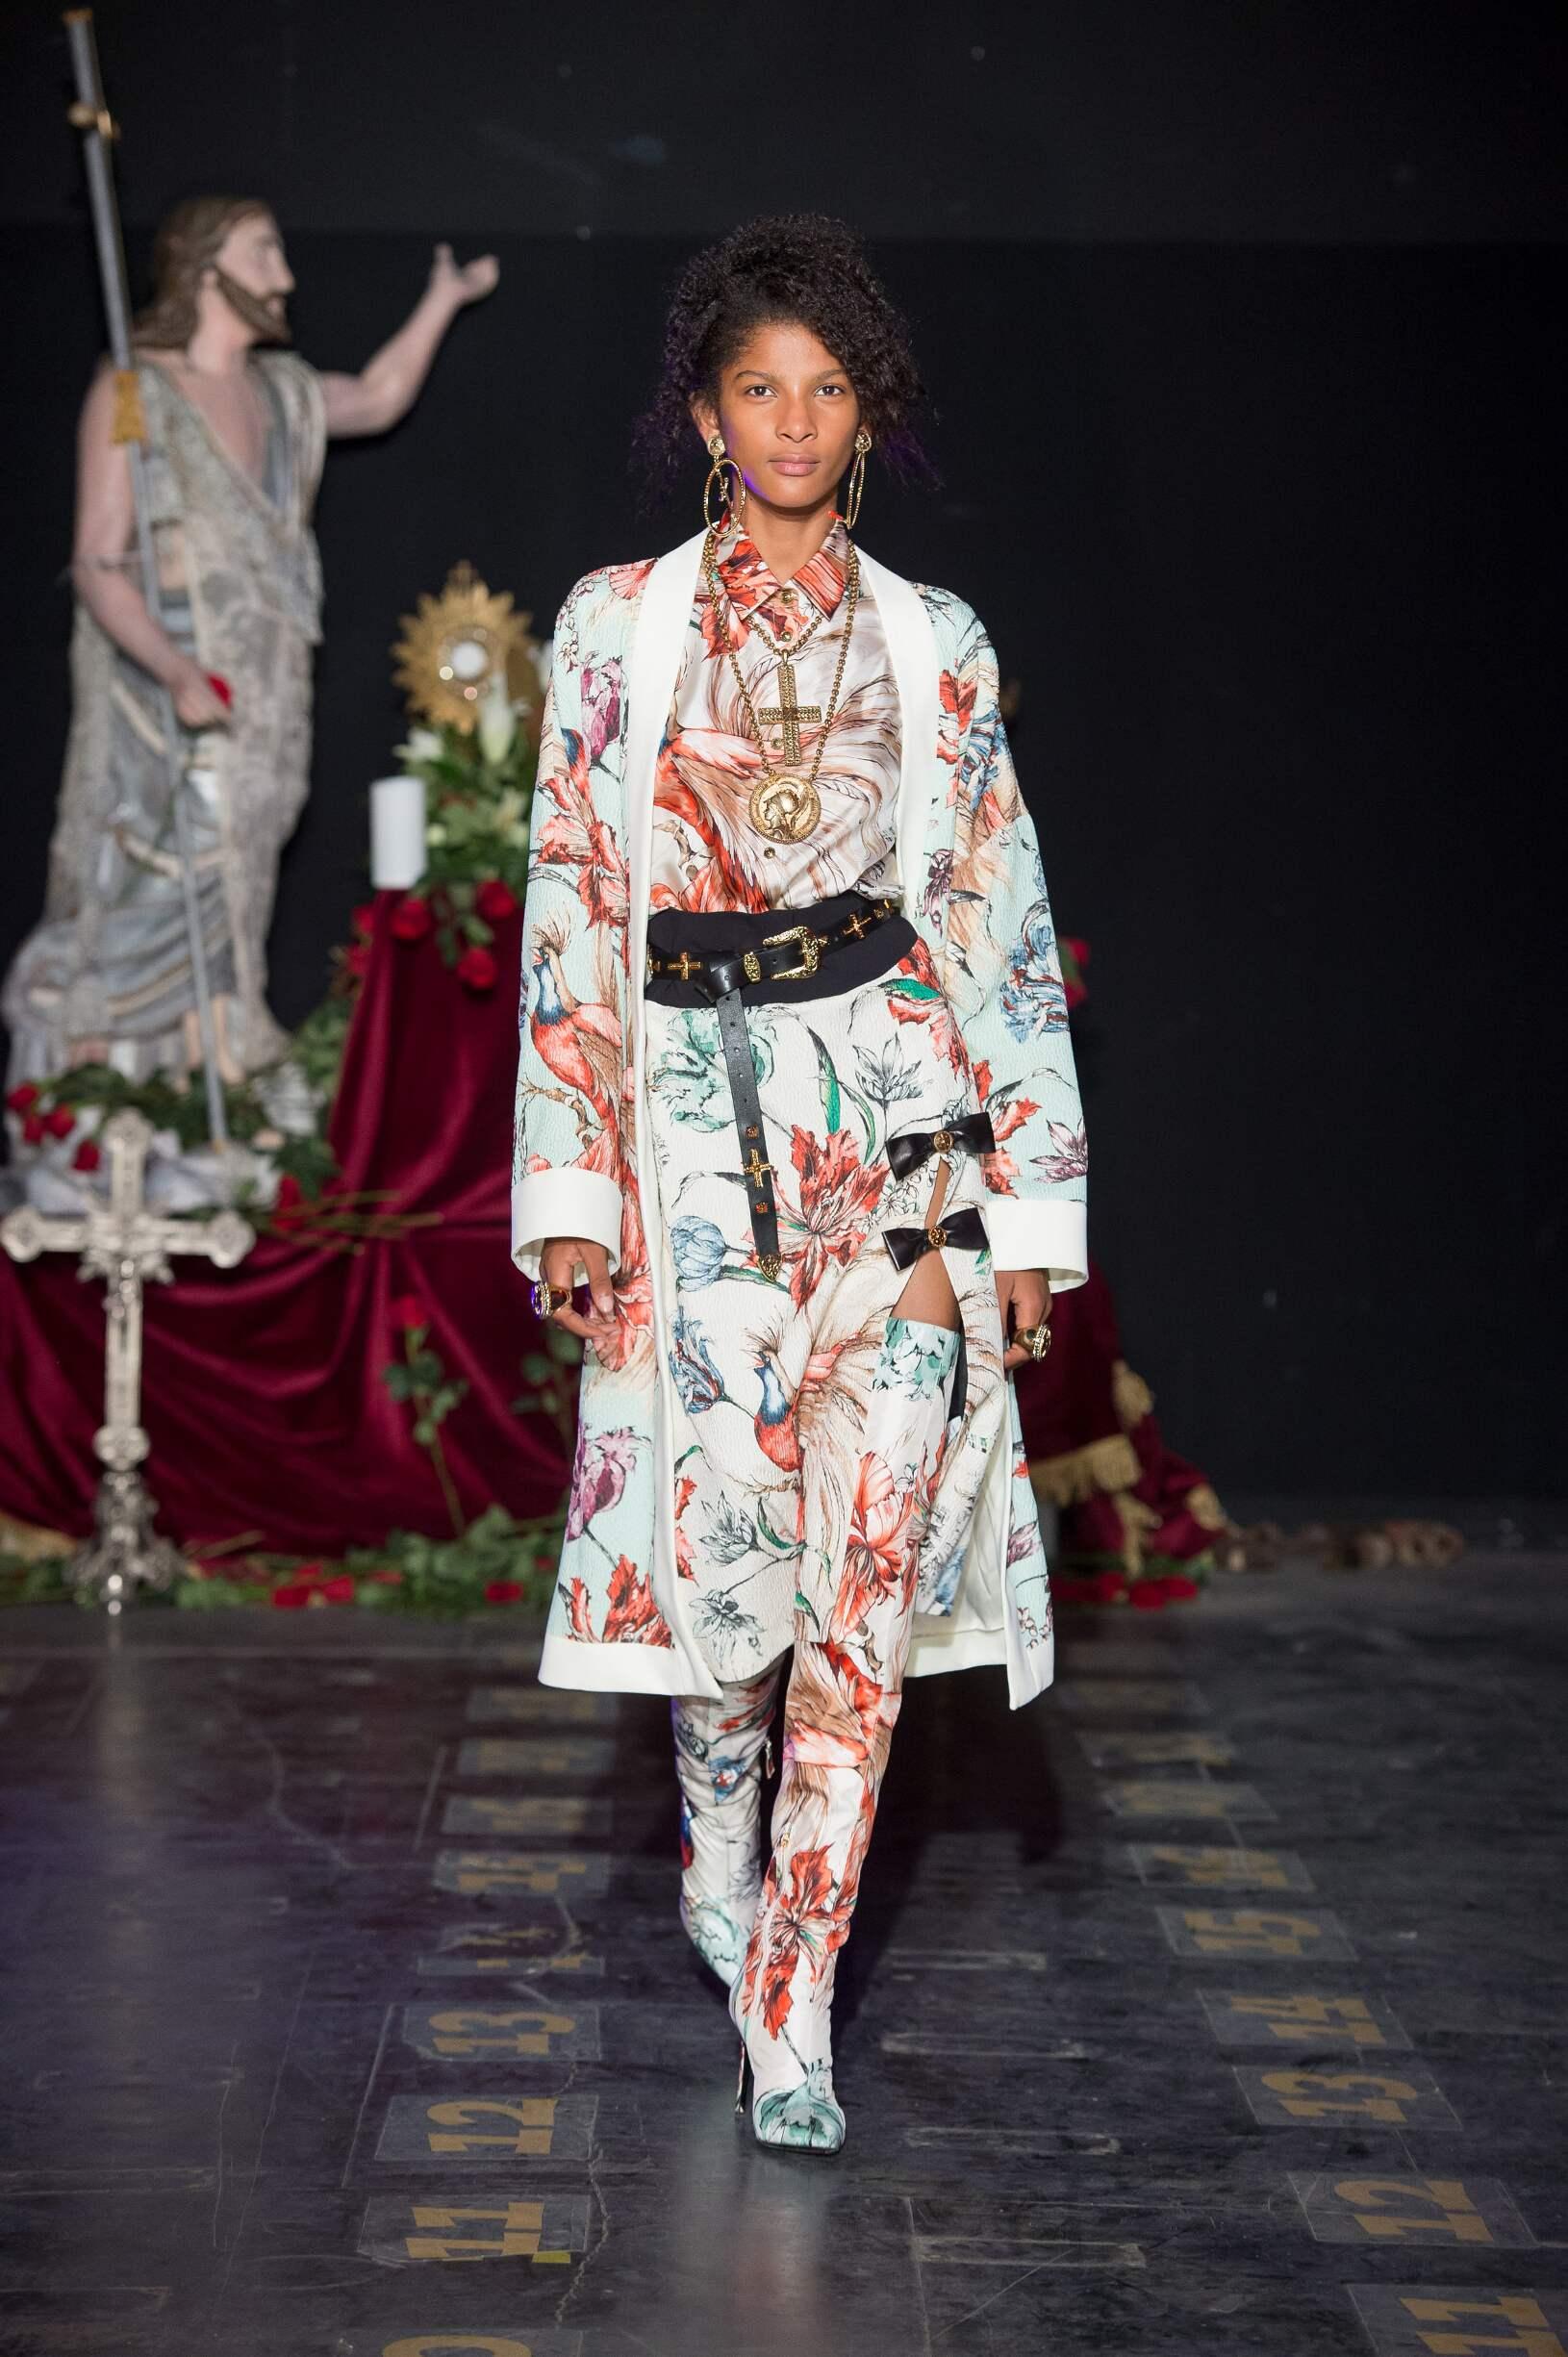 SS 2017 Fausto Puglisi Fashion Show